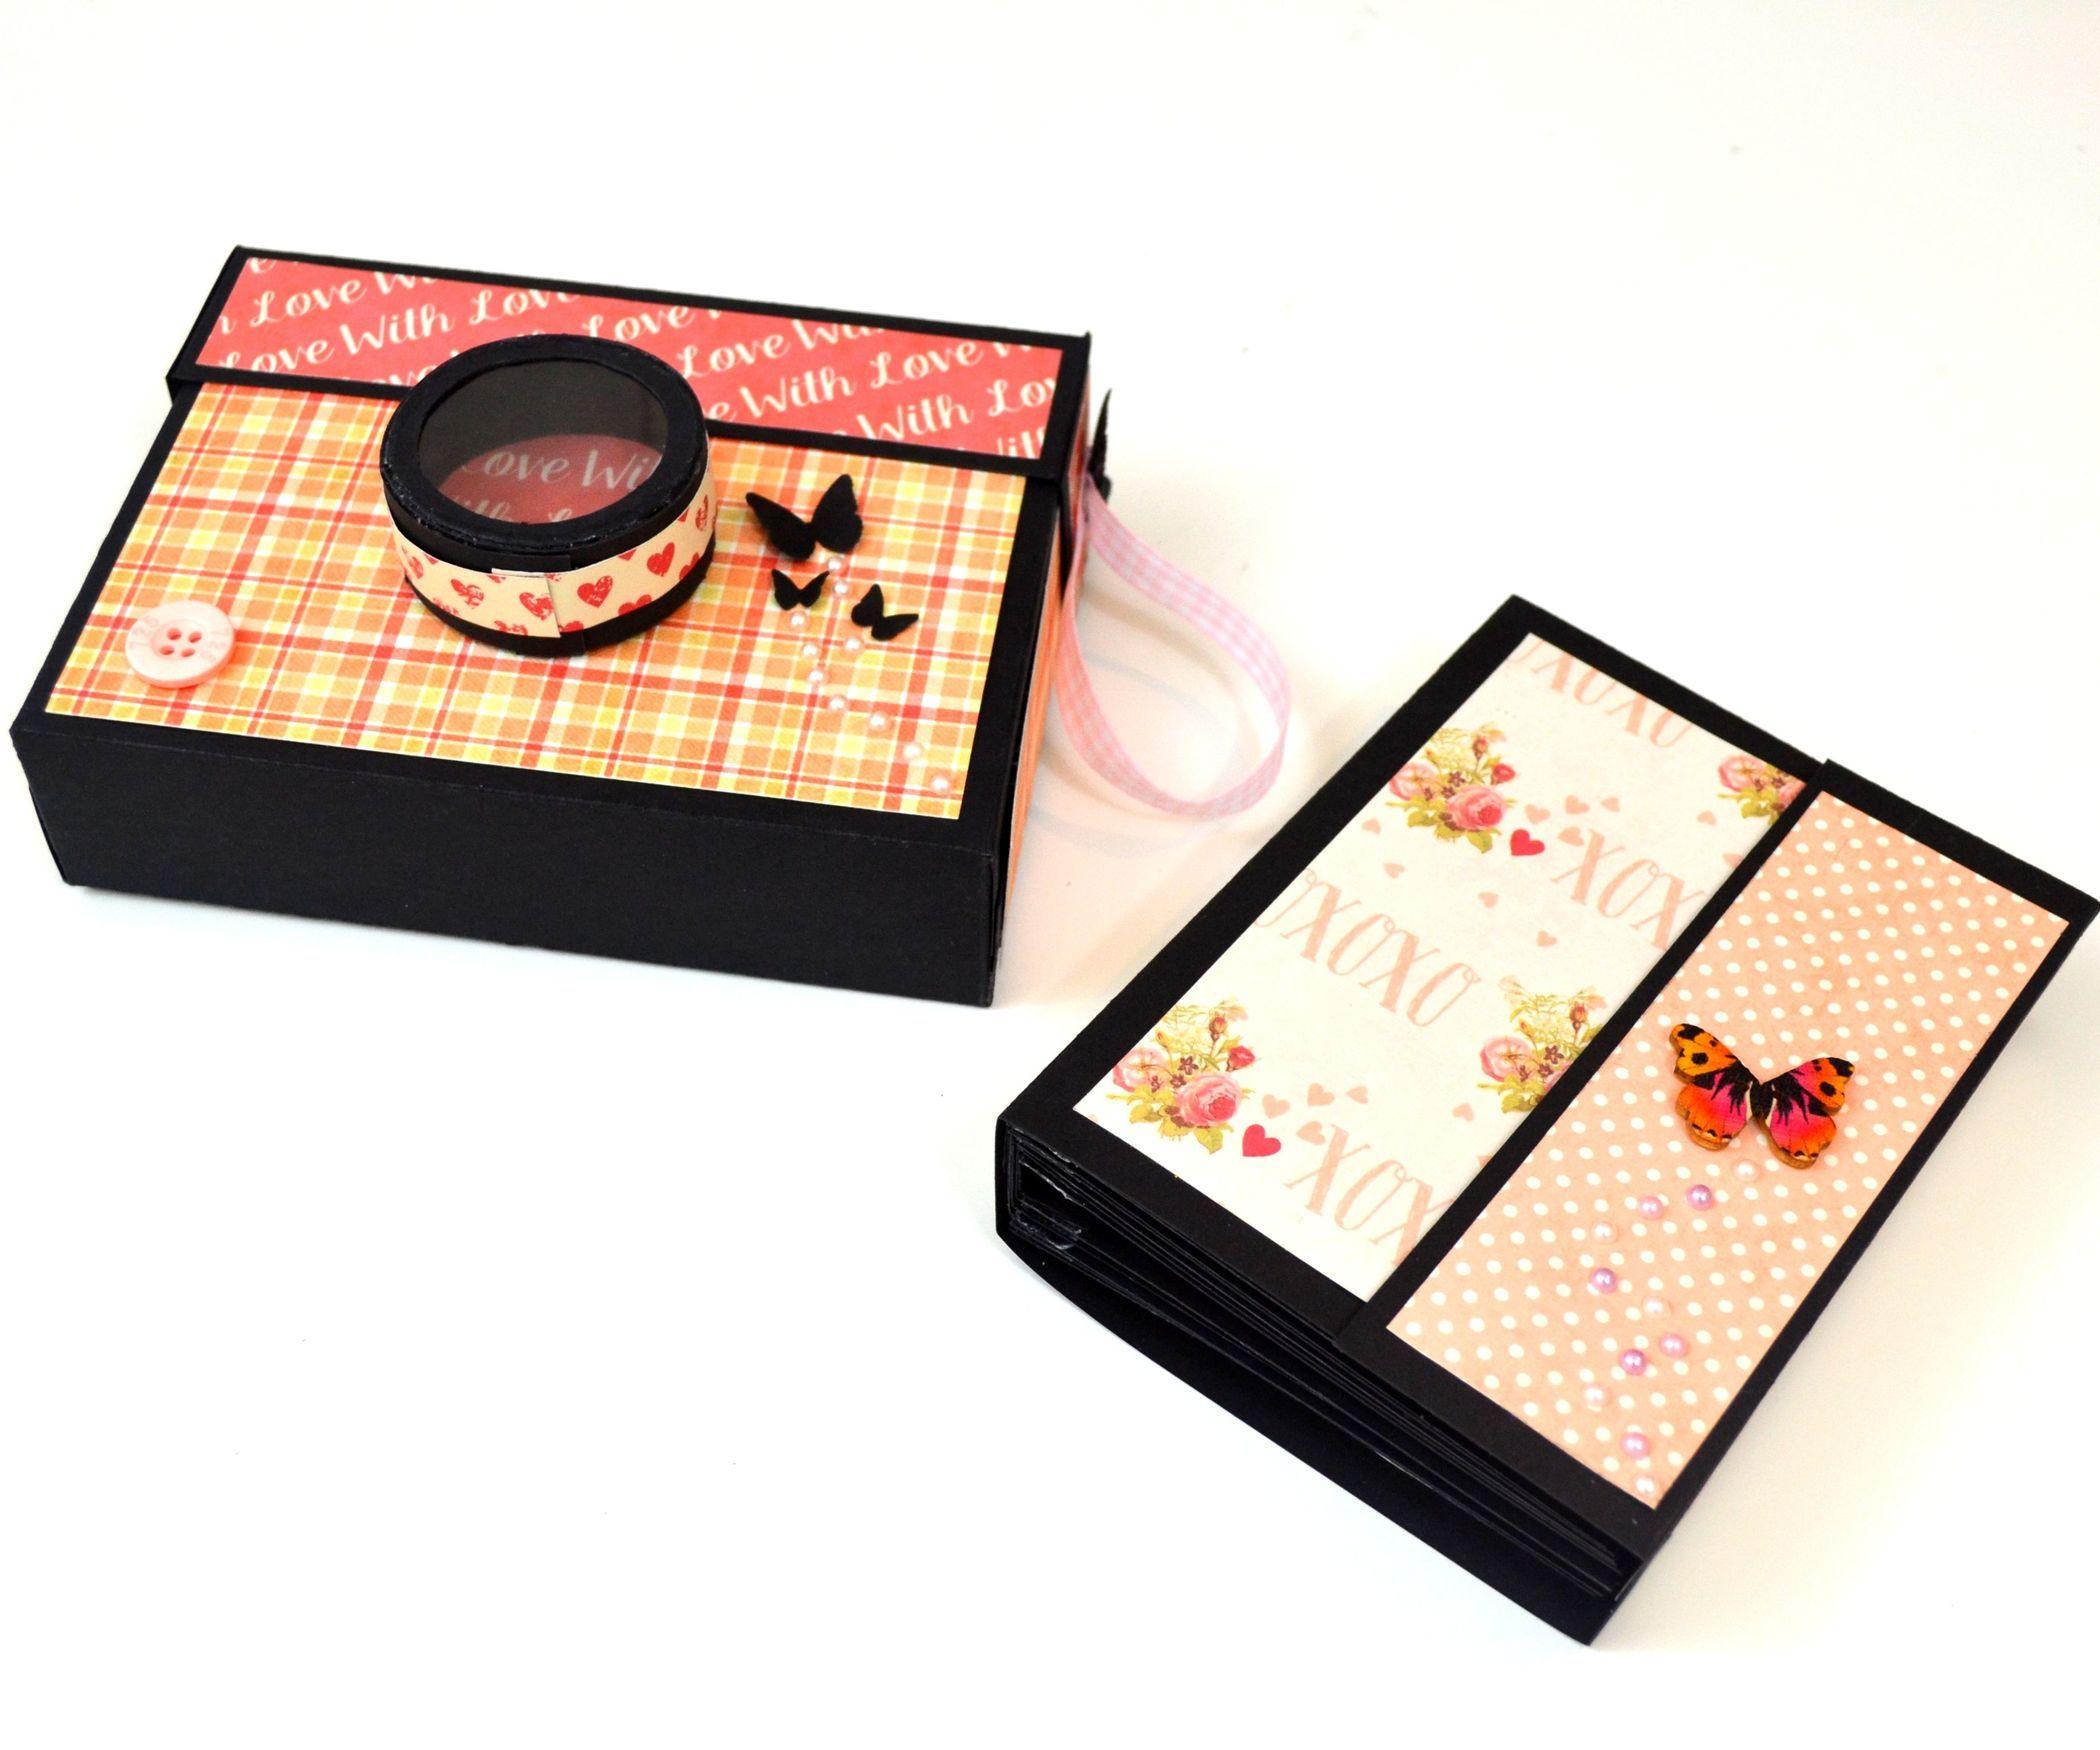 Diy paper crafts how to make a photo mini album